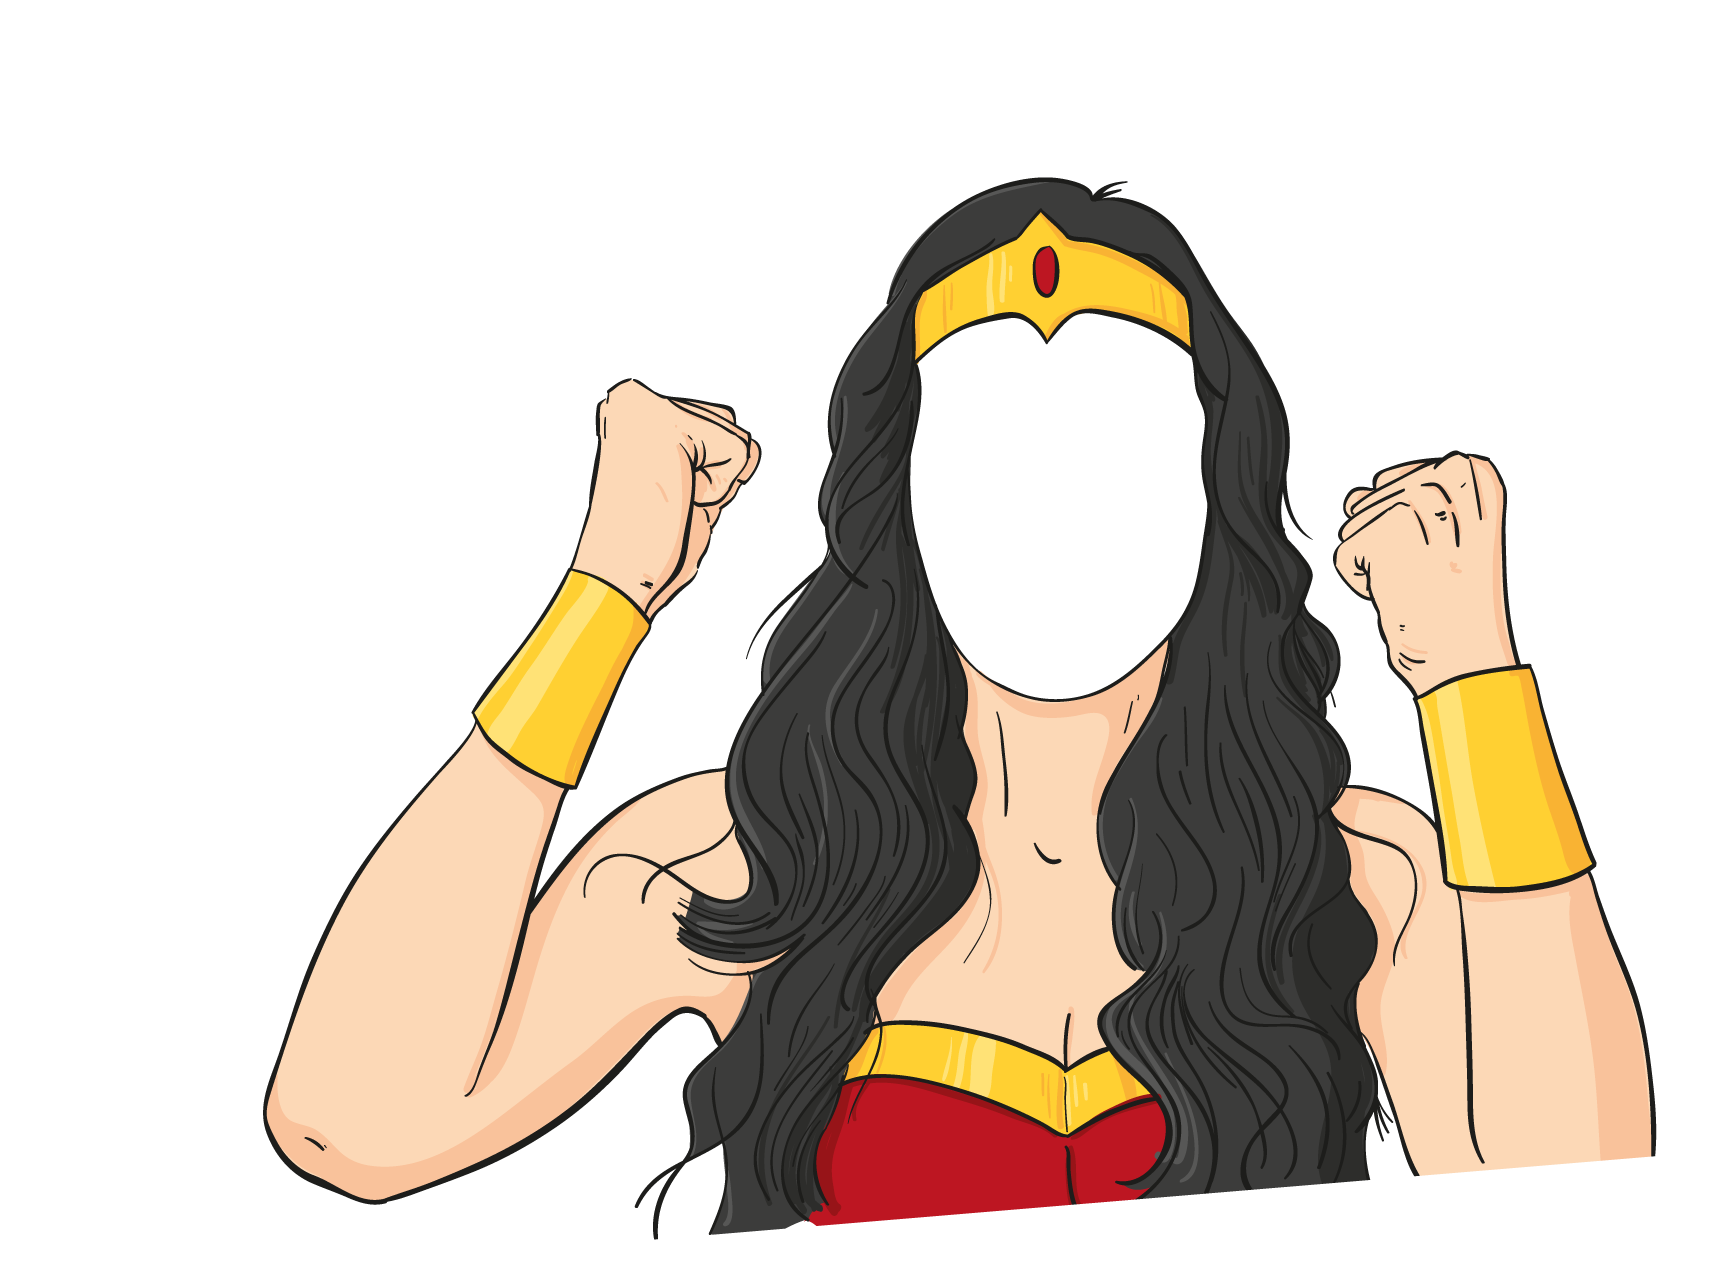 free Why clipart wonder. Woman cartoon free on.